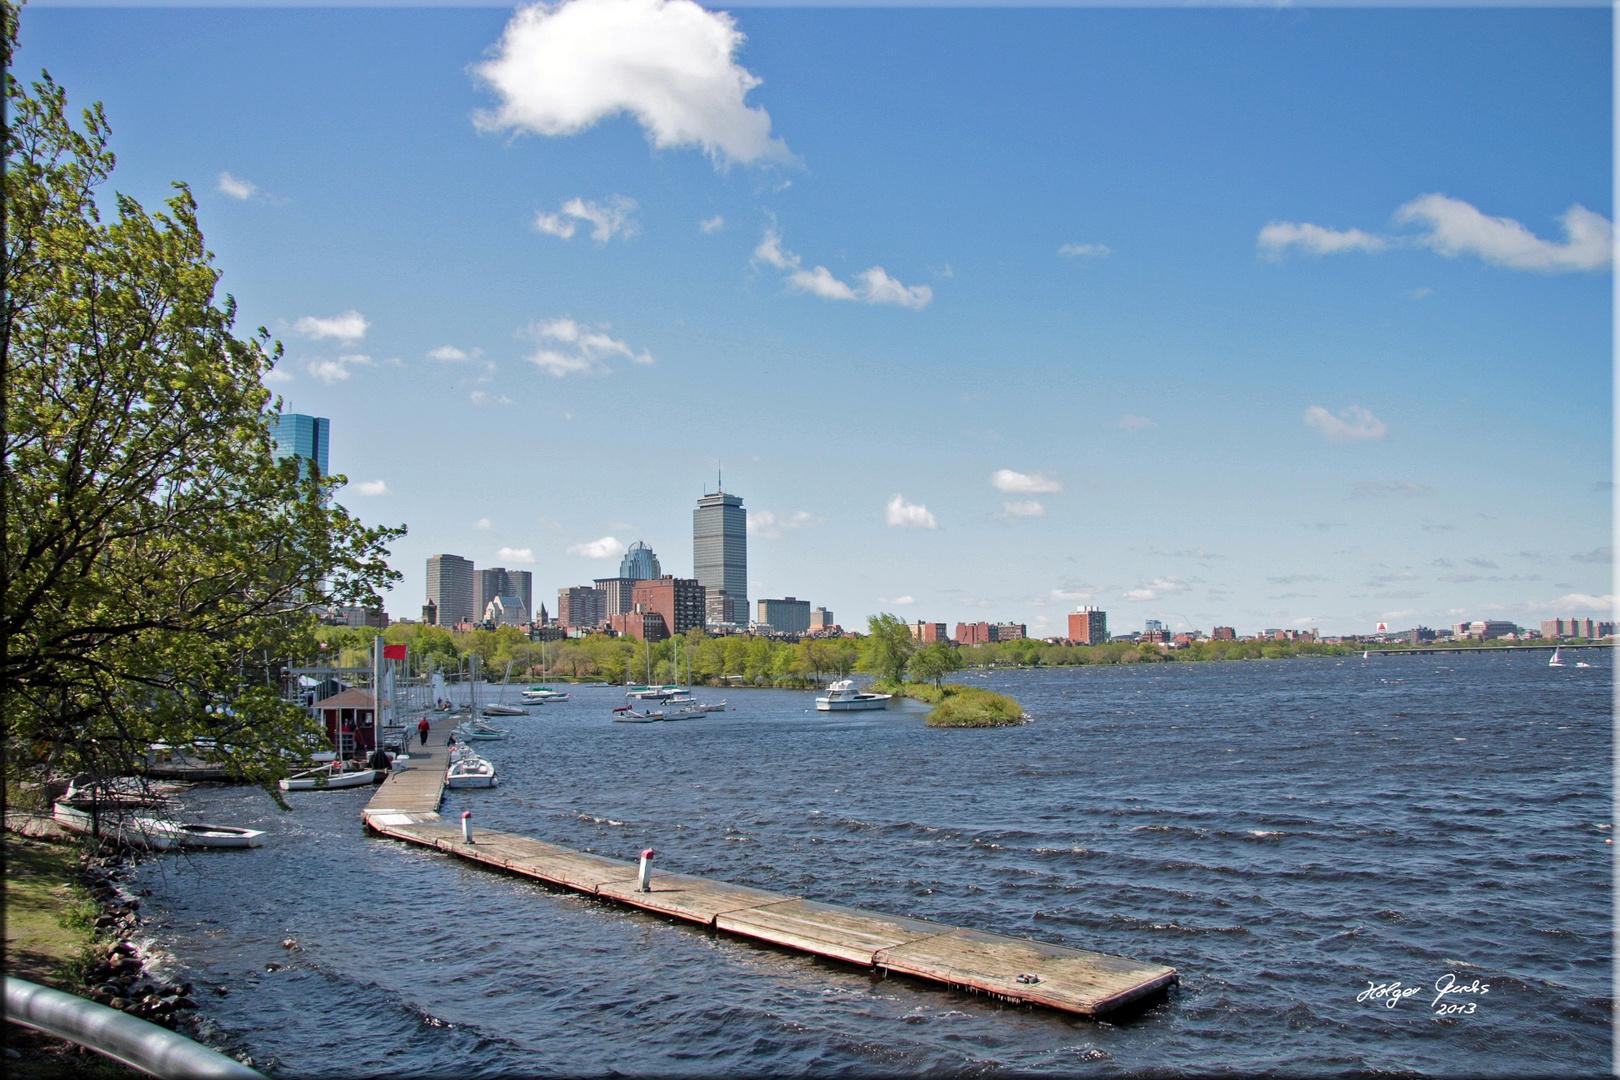 Charles River Boston